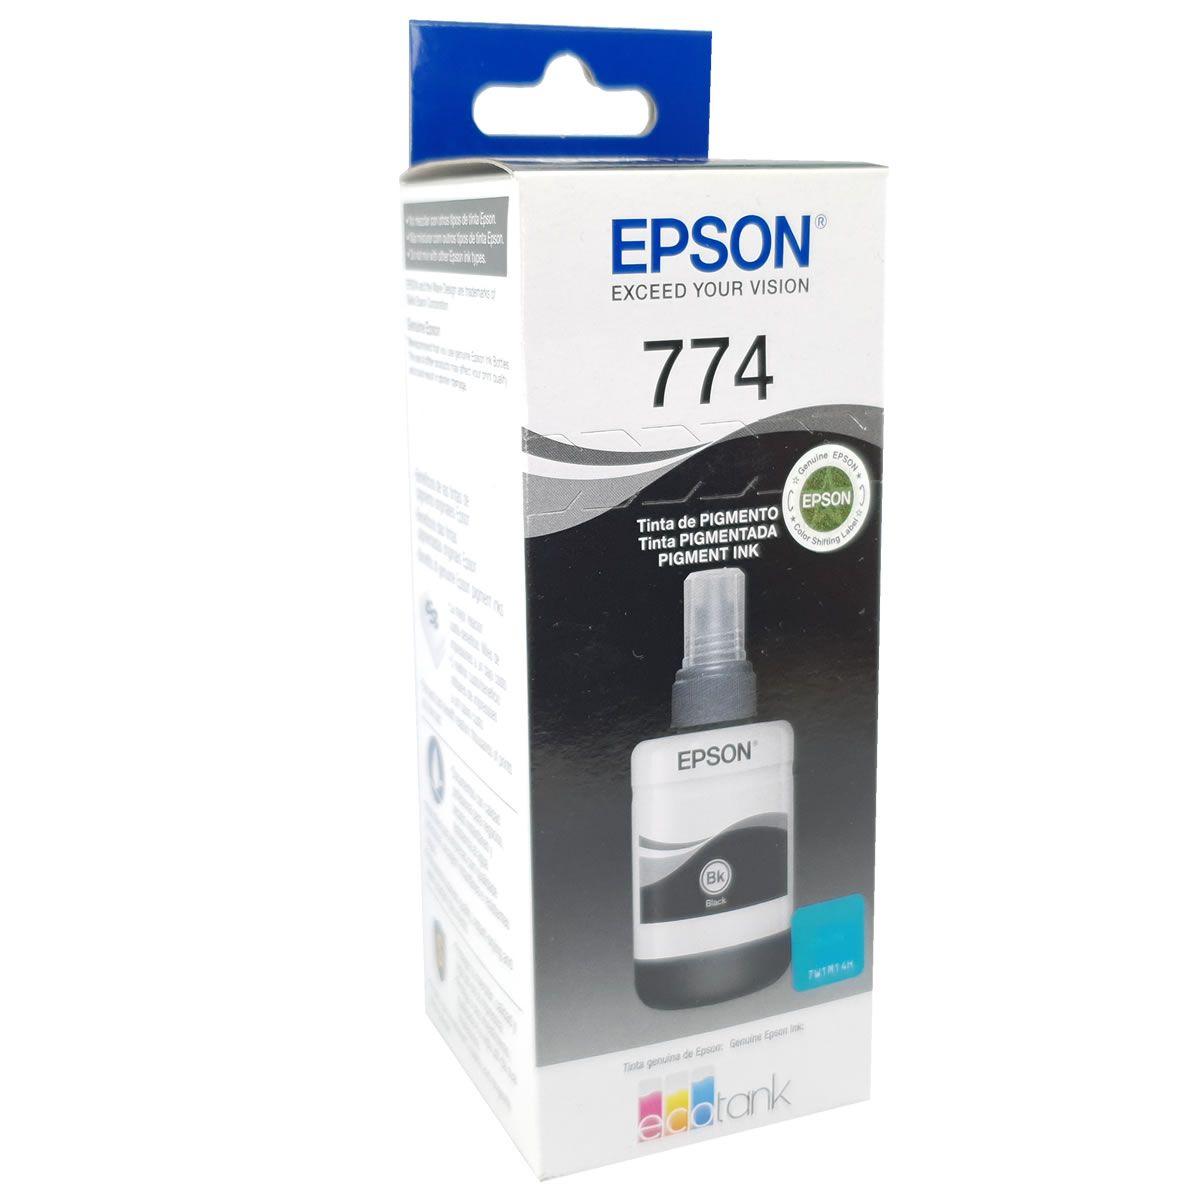 Refil de Tinta EPSON T774120 T7741 Preto 140ml para M100 M105 M200 M205